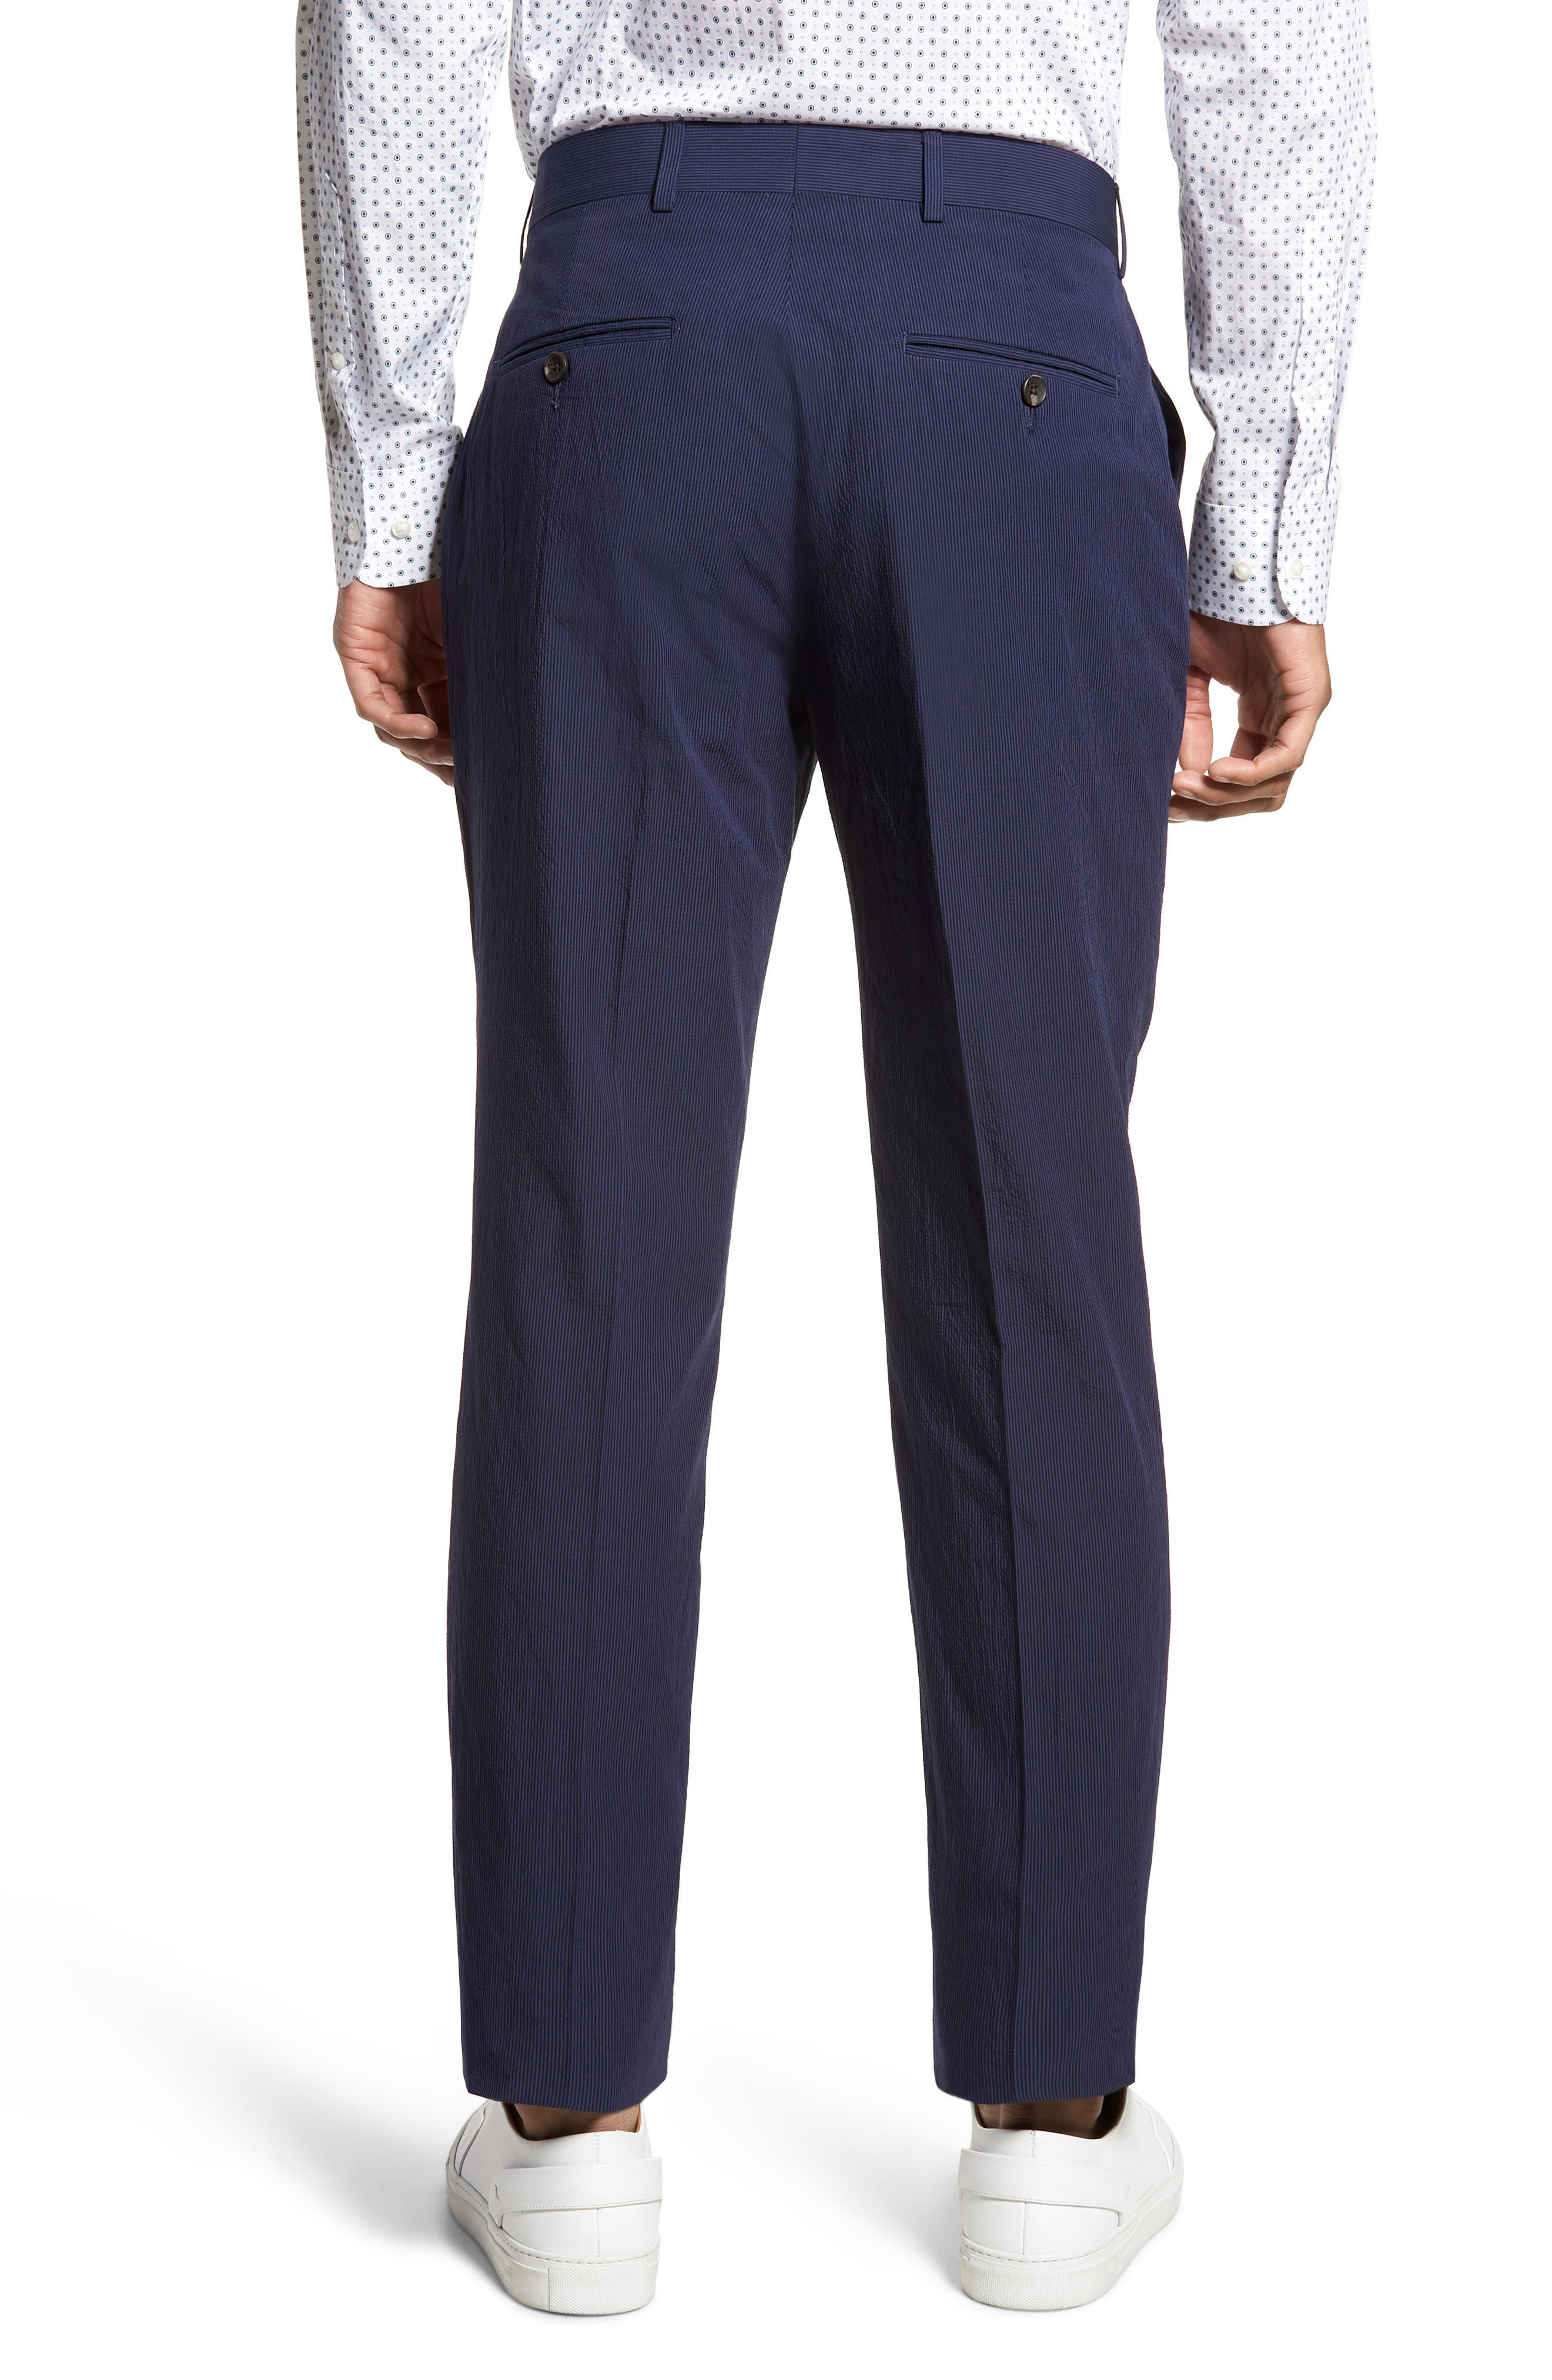 Dagger Flat Front Seersucker Trousers,                             Alternate thumbnail 2, color,                             400